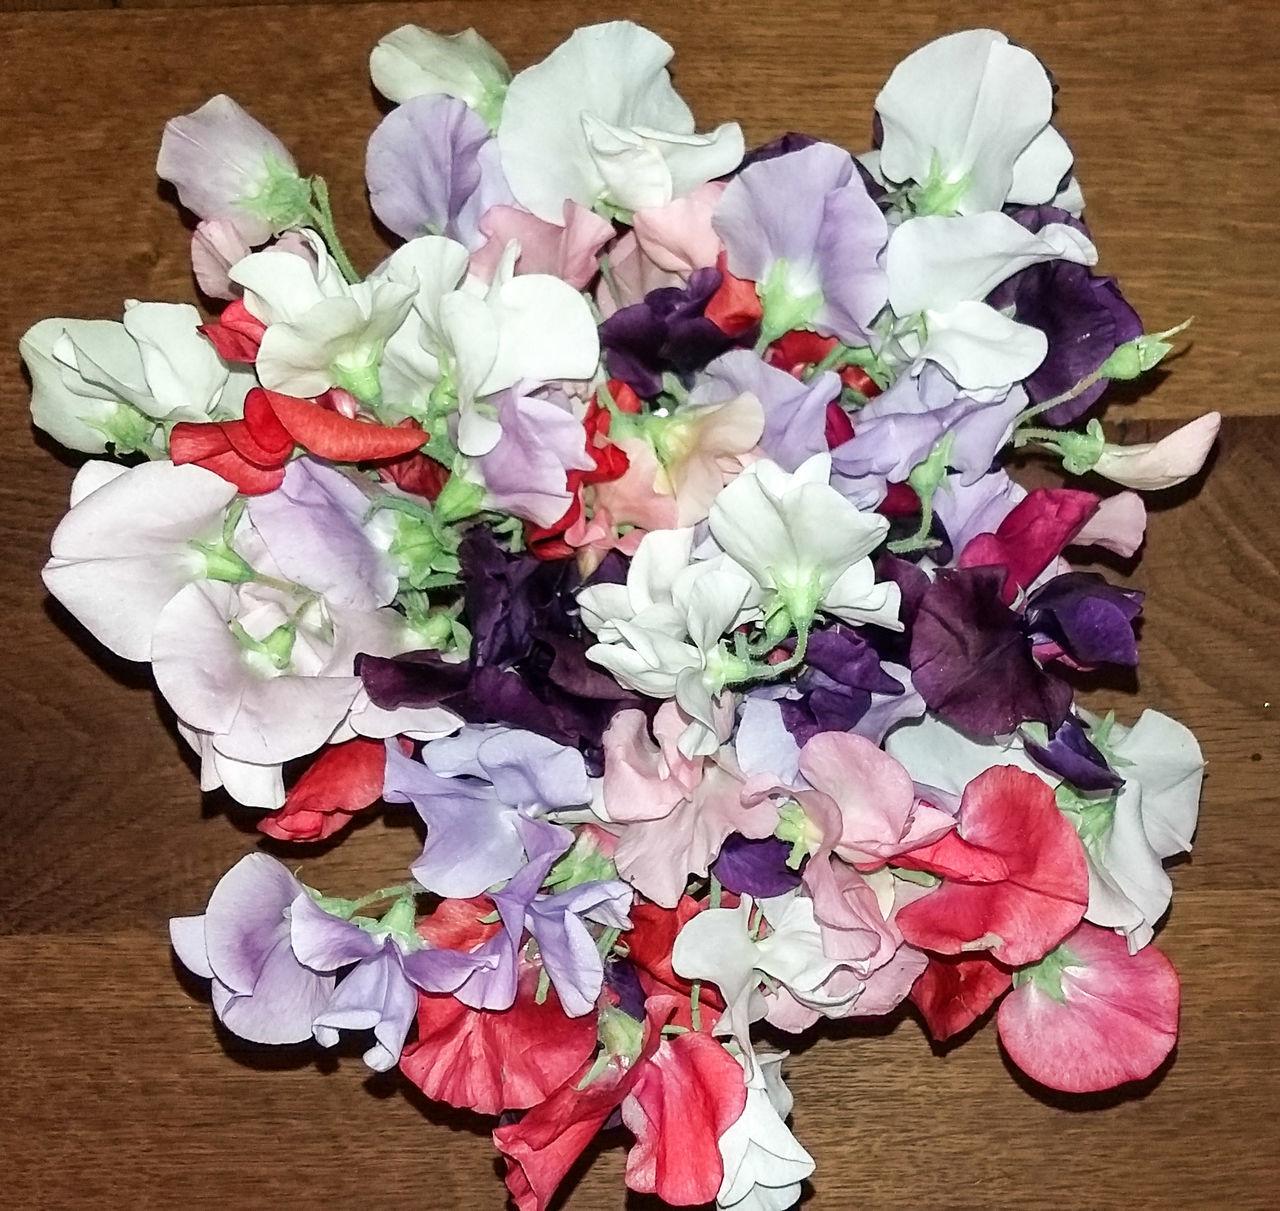 Birthday Flowers Blütenpracht Frühlingsstrauss Colorful Zarte Blüte Flowers MAI Blütenzauber Nofilter Good Times